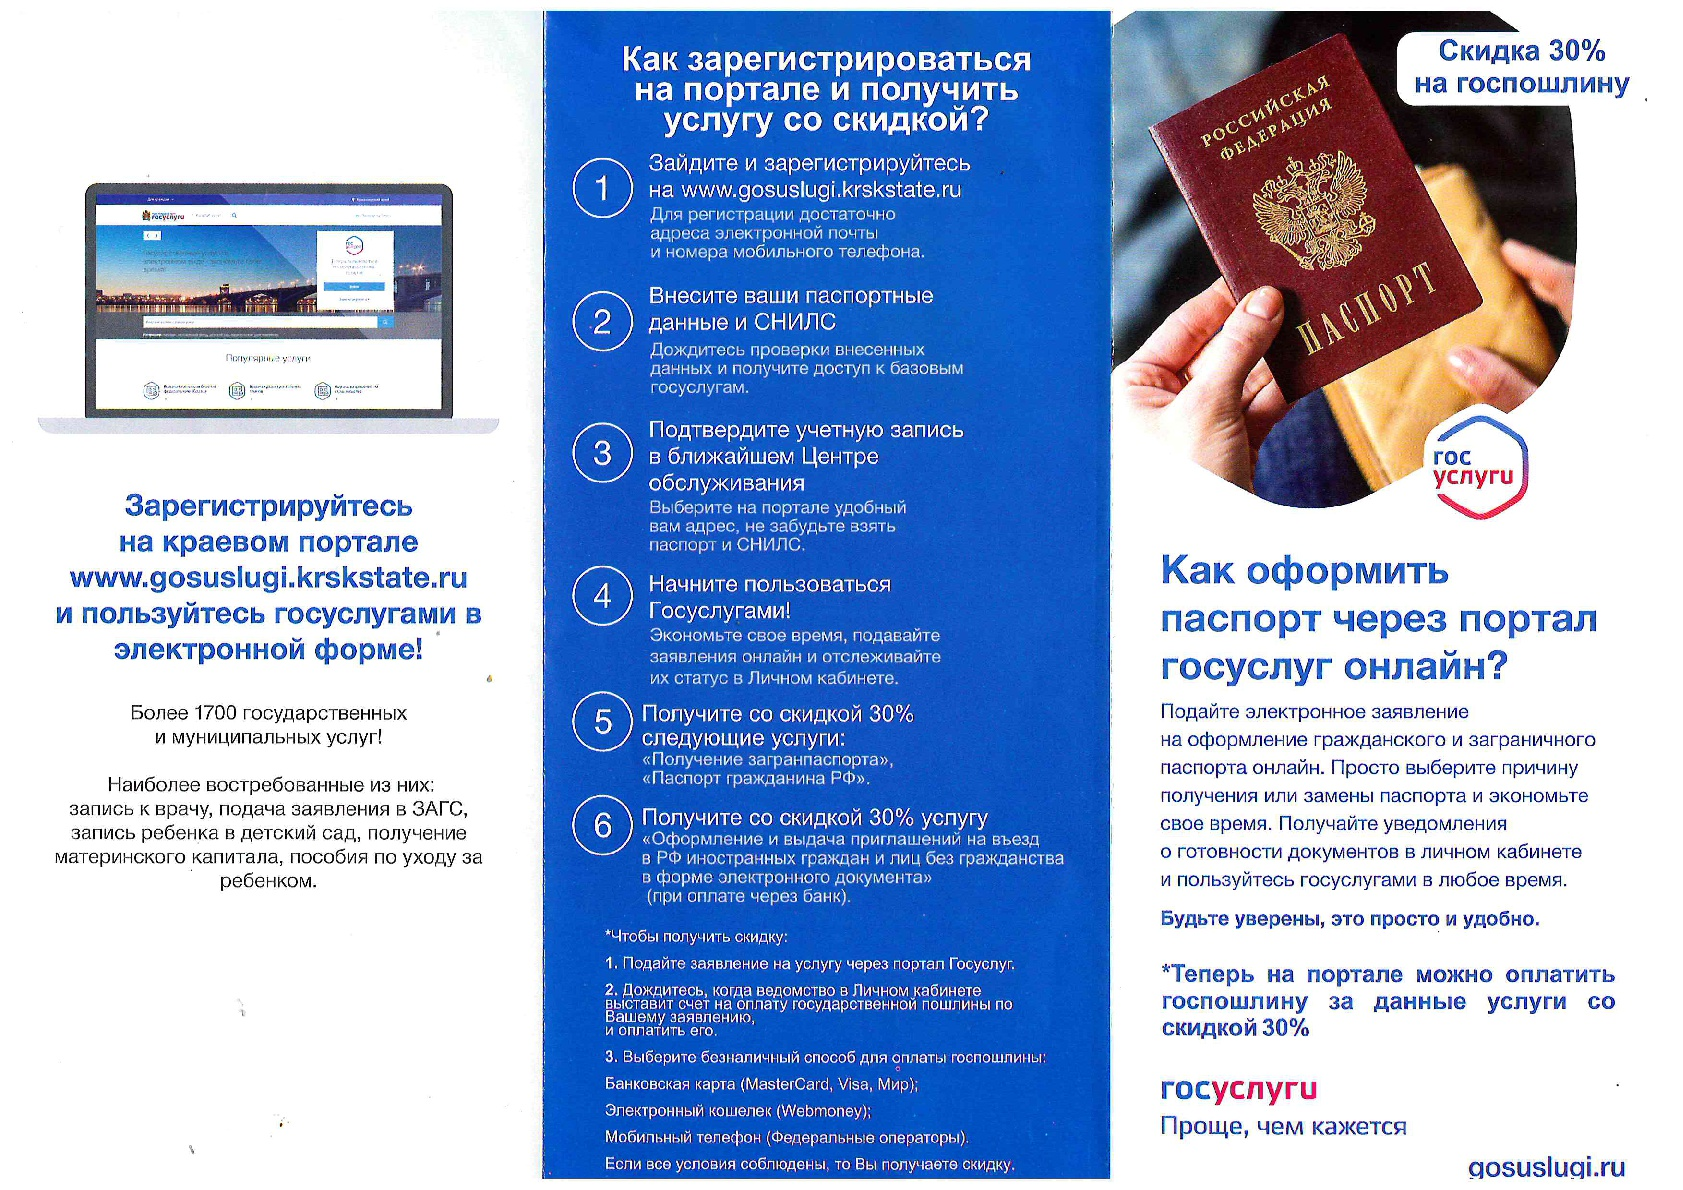 !!! Работа паспортного стола по адресу ул. Карамзина, д. 18